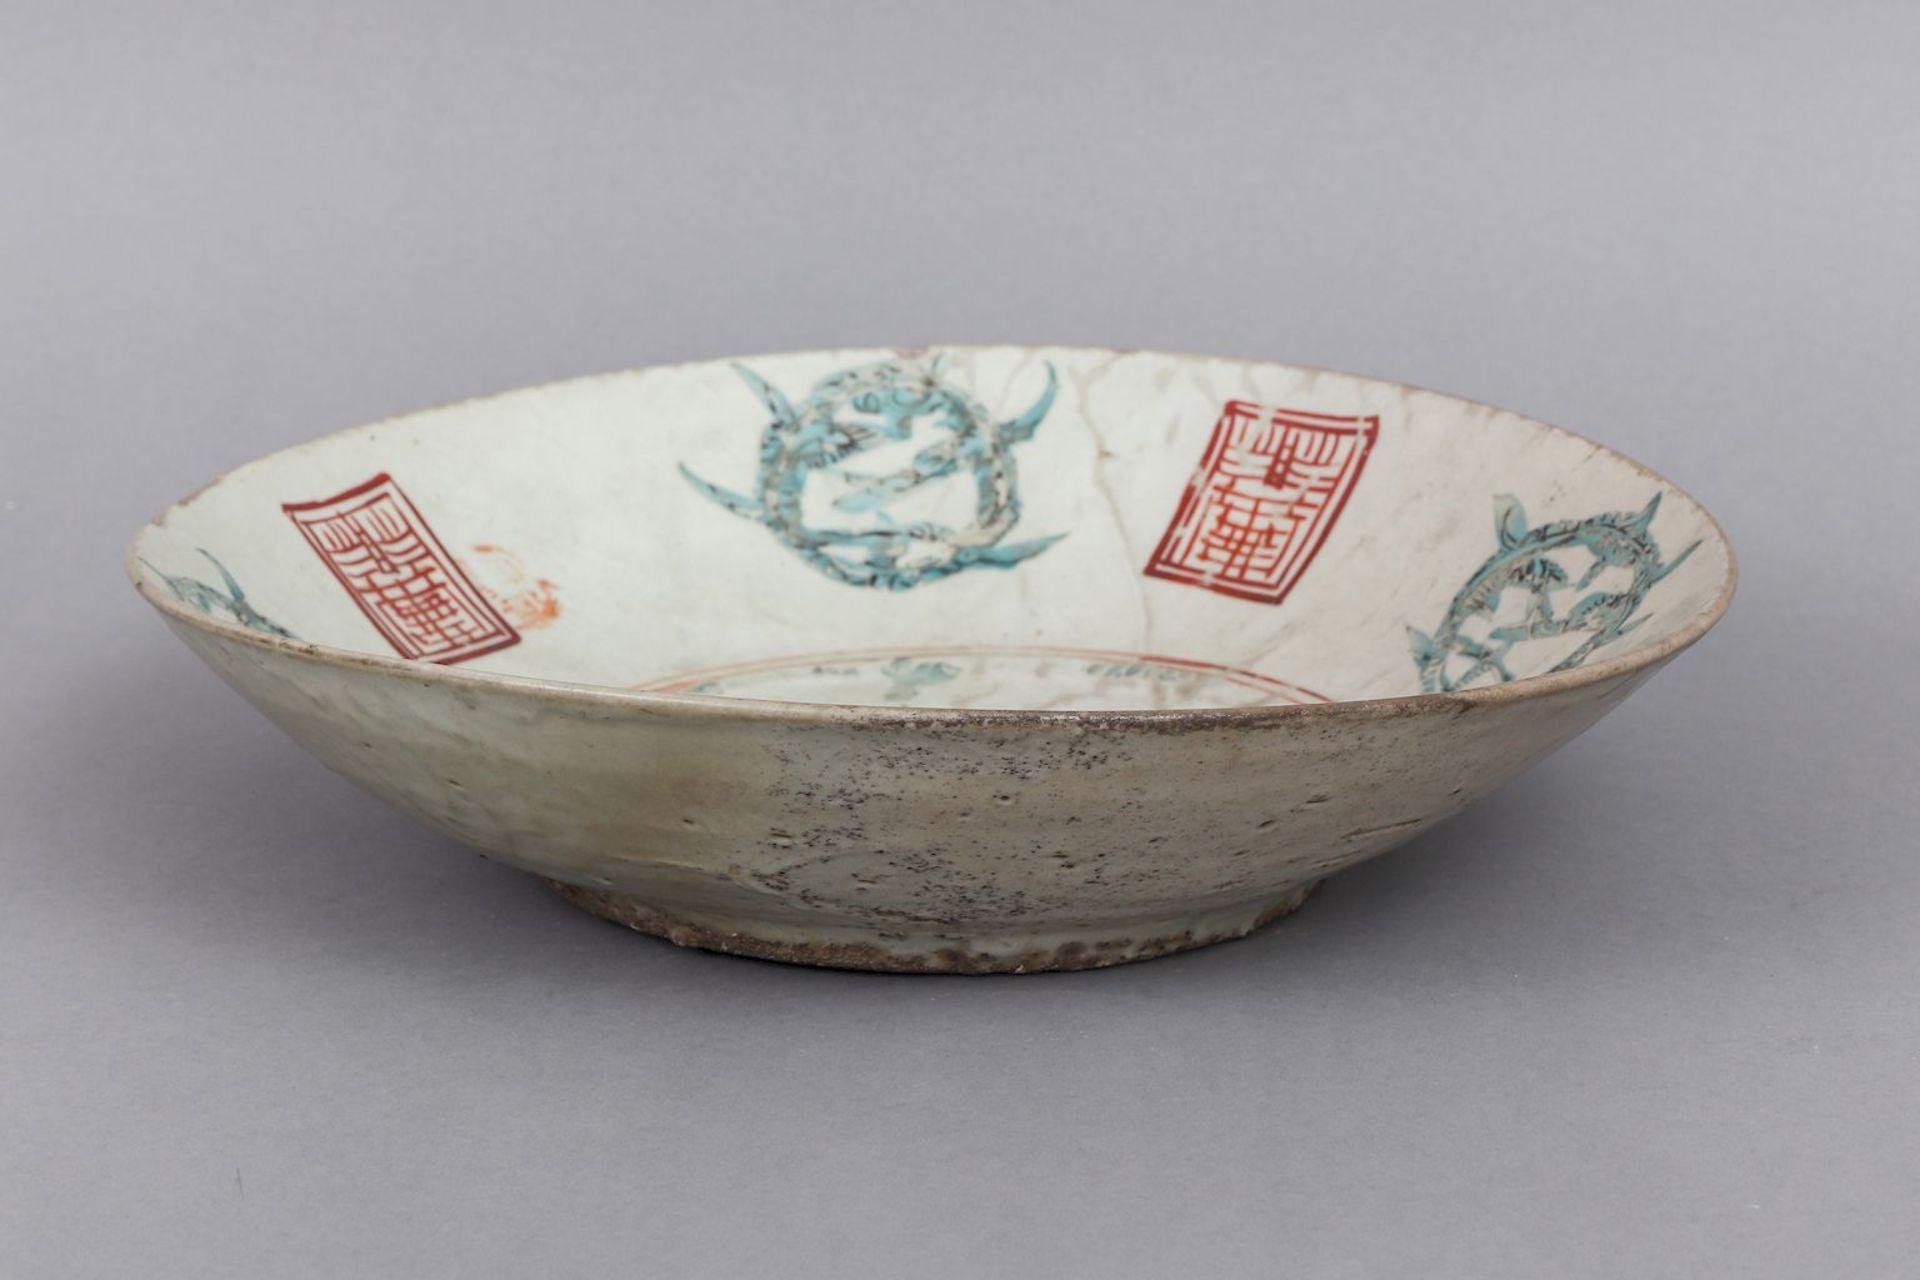 Chinesische Porzellanschale - Image 2 of 4